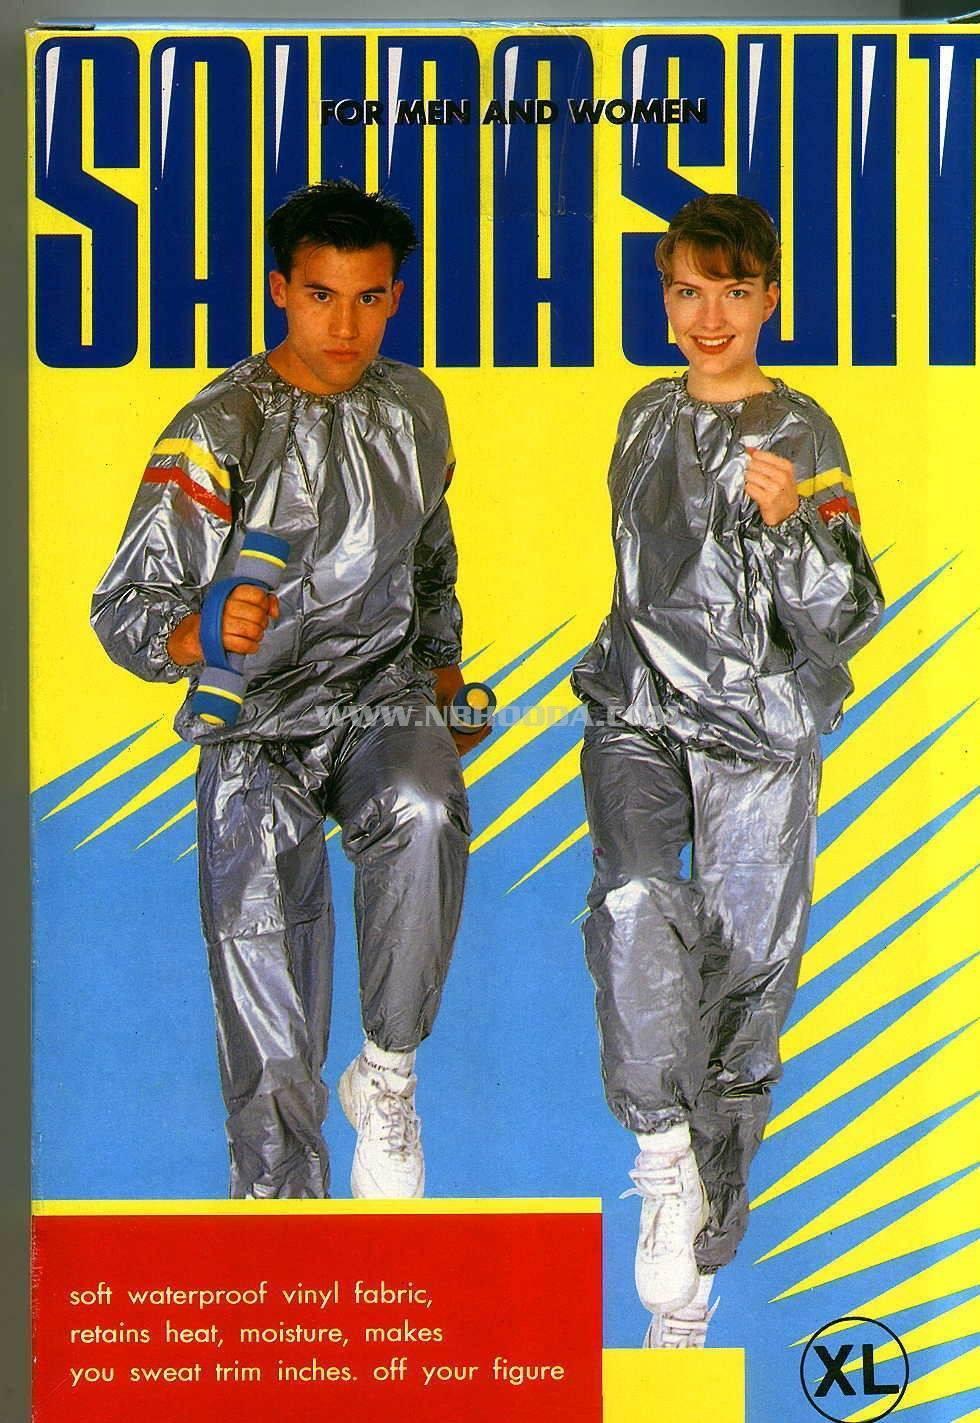 SAUNA SWEAT EXERCISE SUIT,Sauna Suit (HD0237)